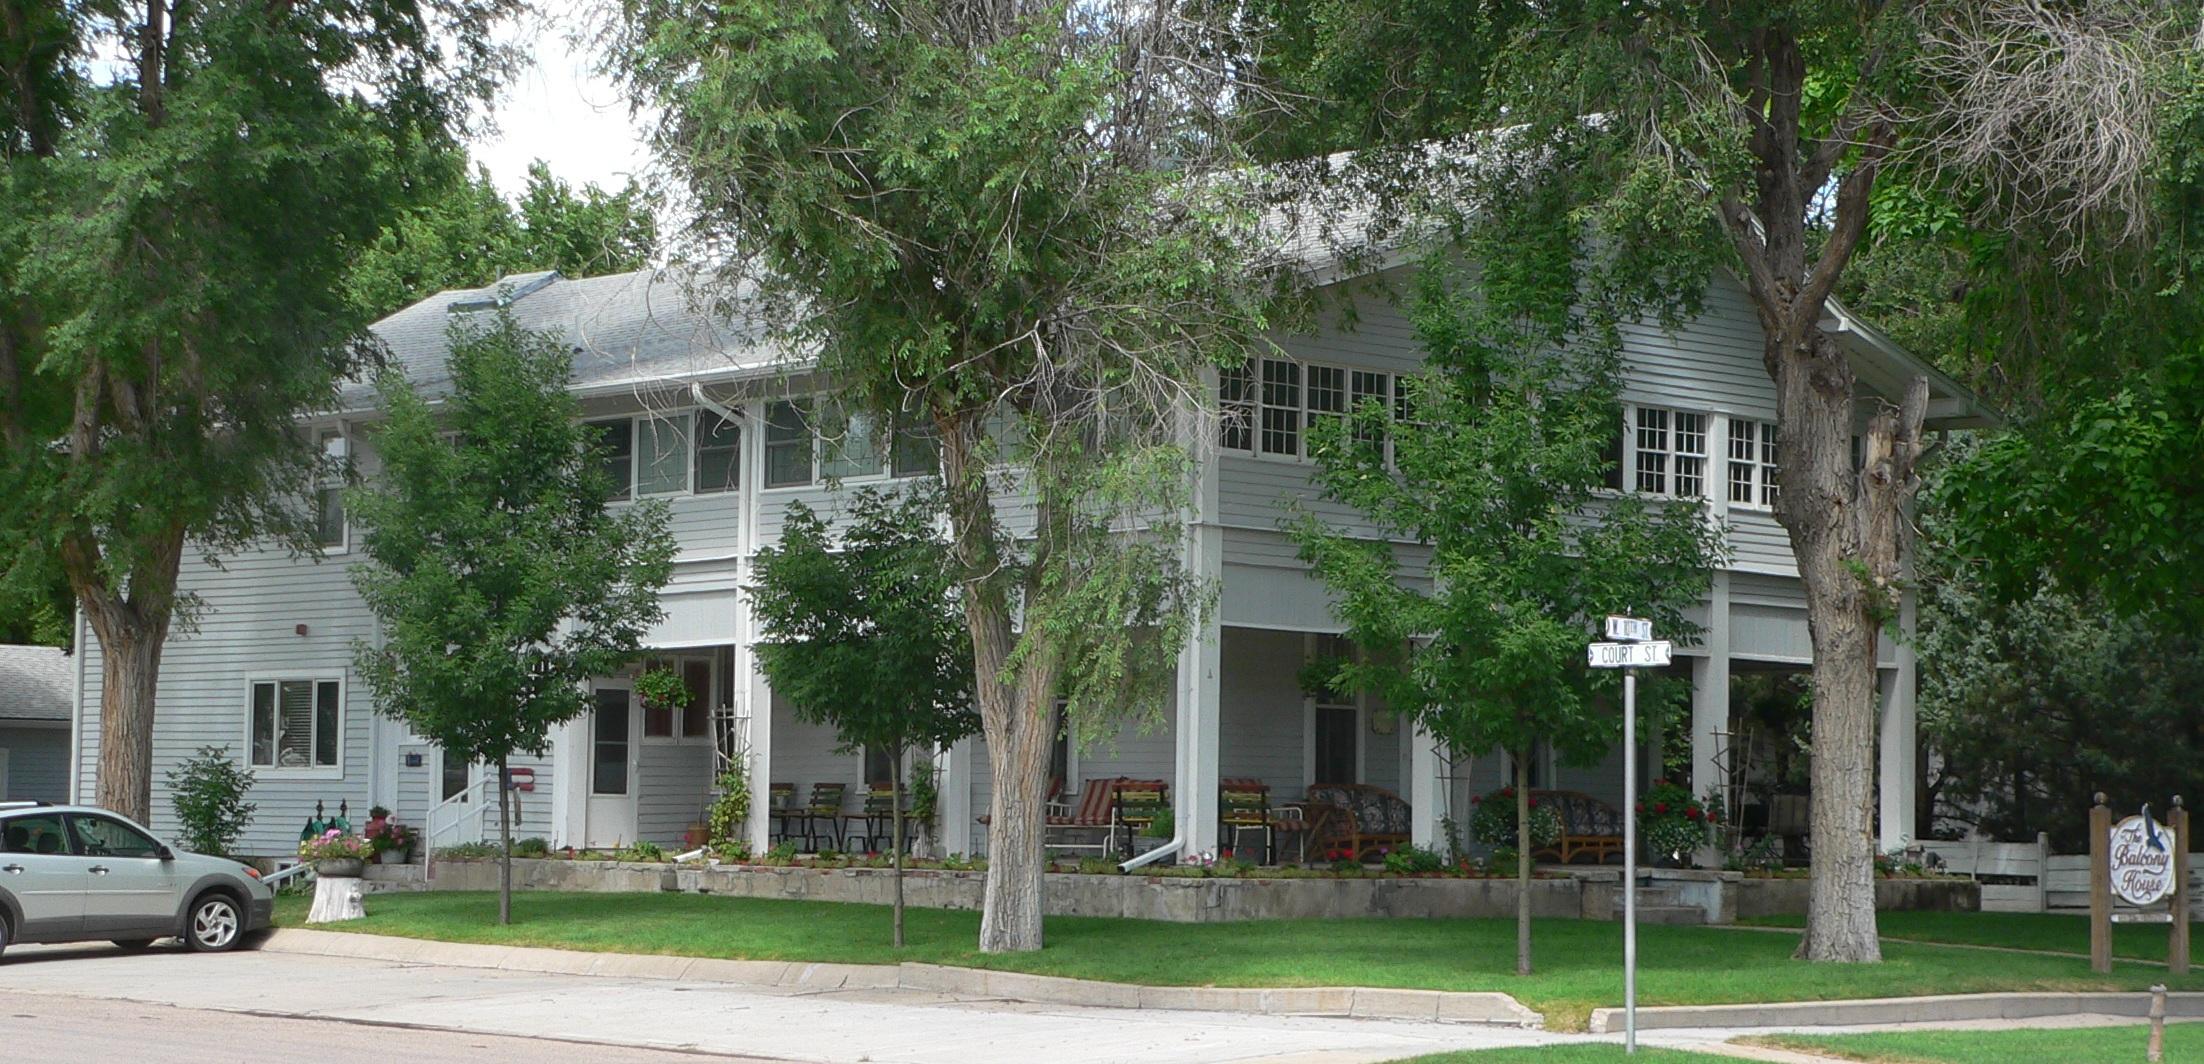 File:Balcony House (Imperial, Nebraska) from SW 2.JPG ...